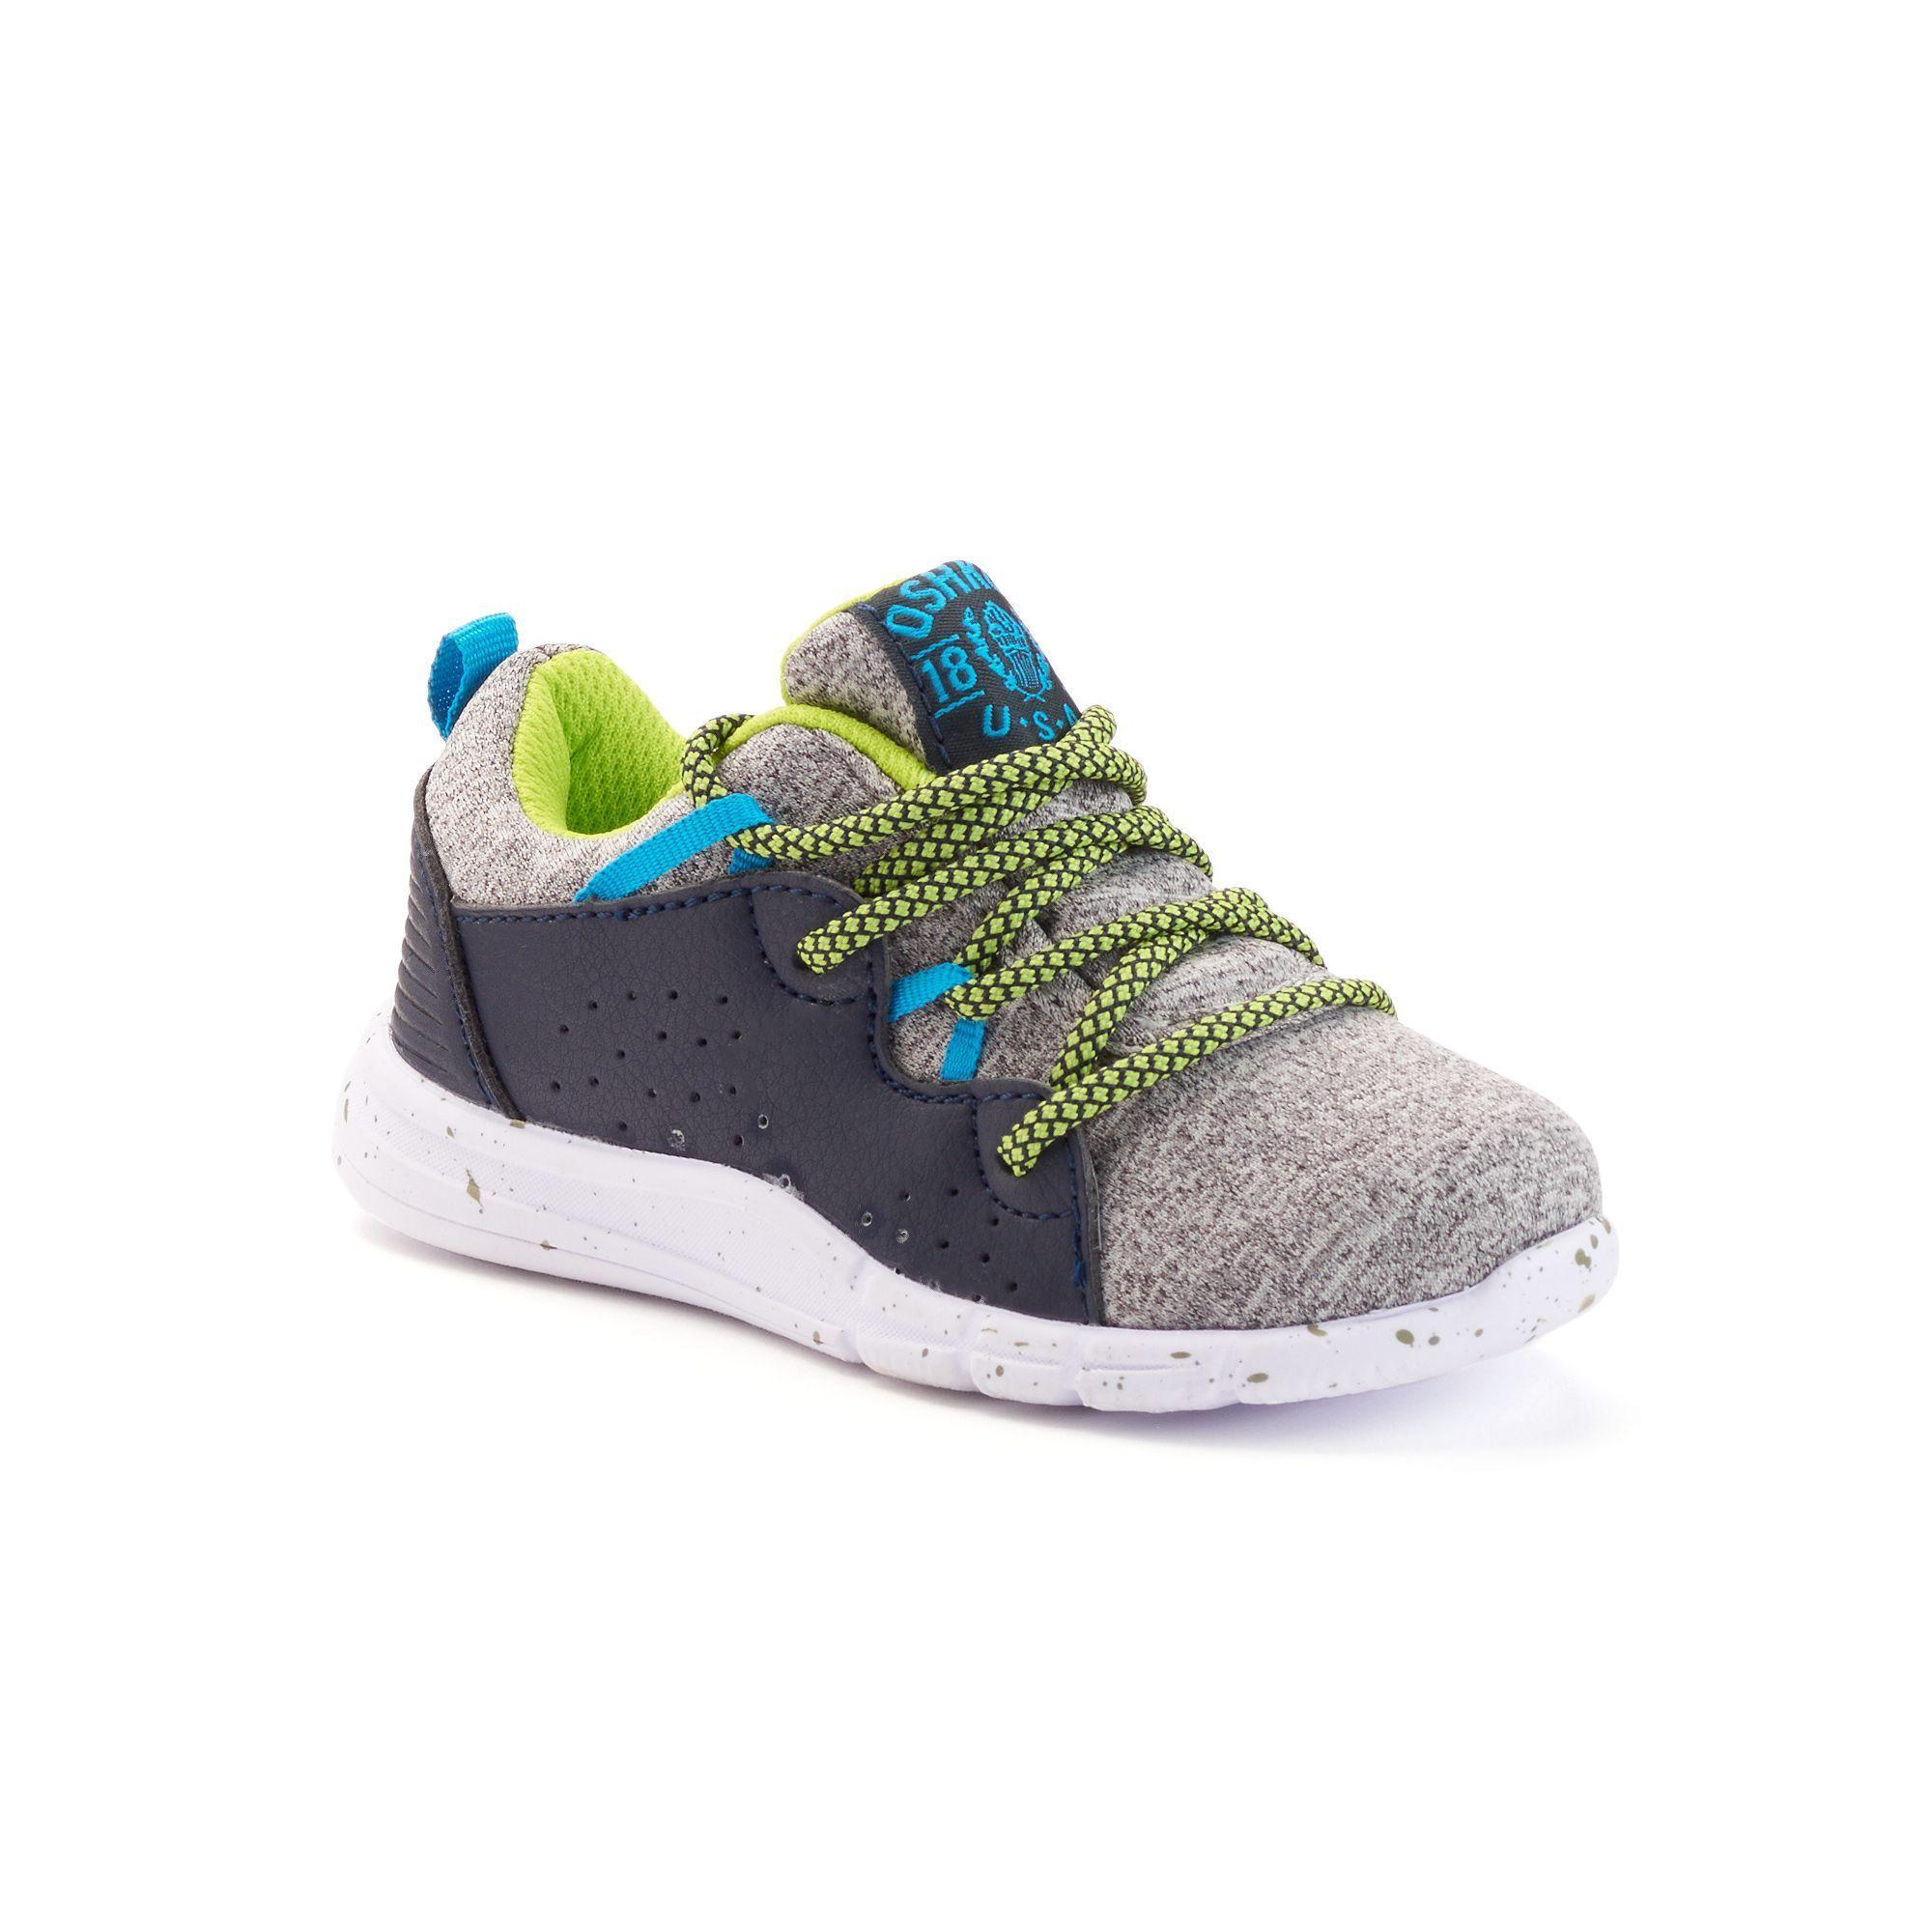 ff9b61fcb28 OshKosh B gosh® Brooks Toddler Boys  Sneakers